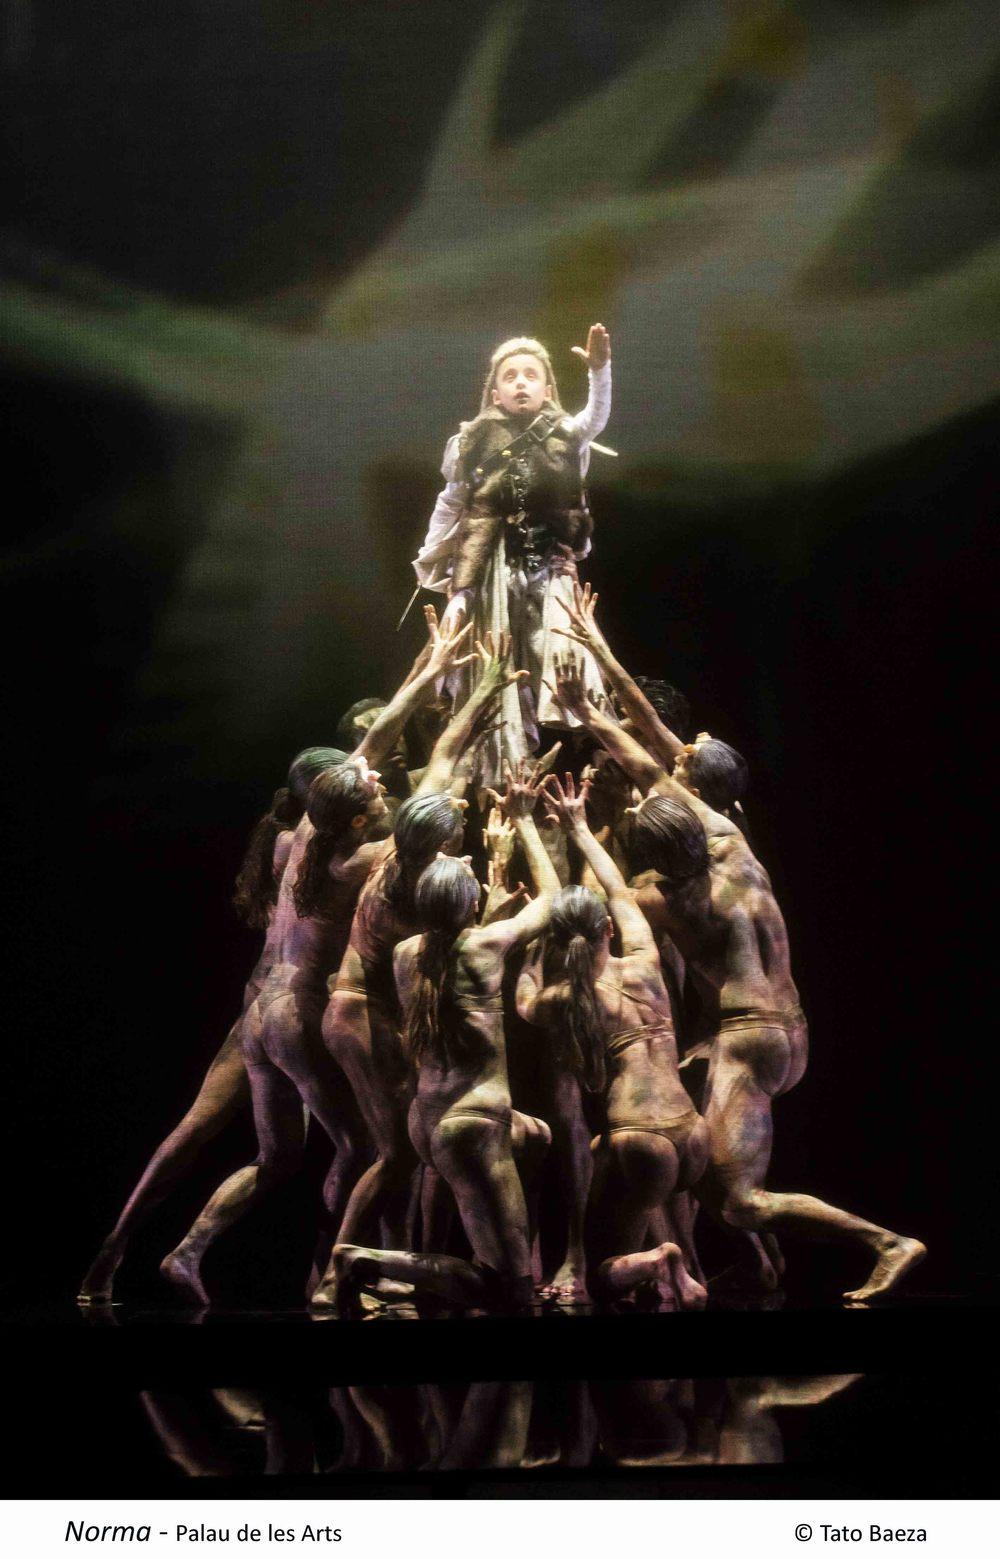 Norma - Les Arts 2015 - Tato Baeza (4).jpg